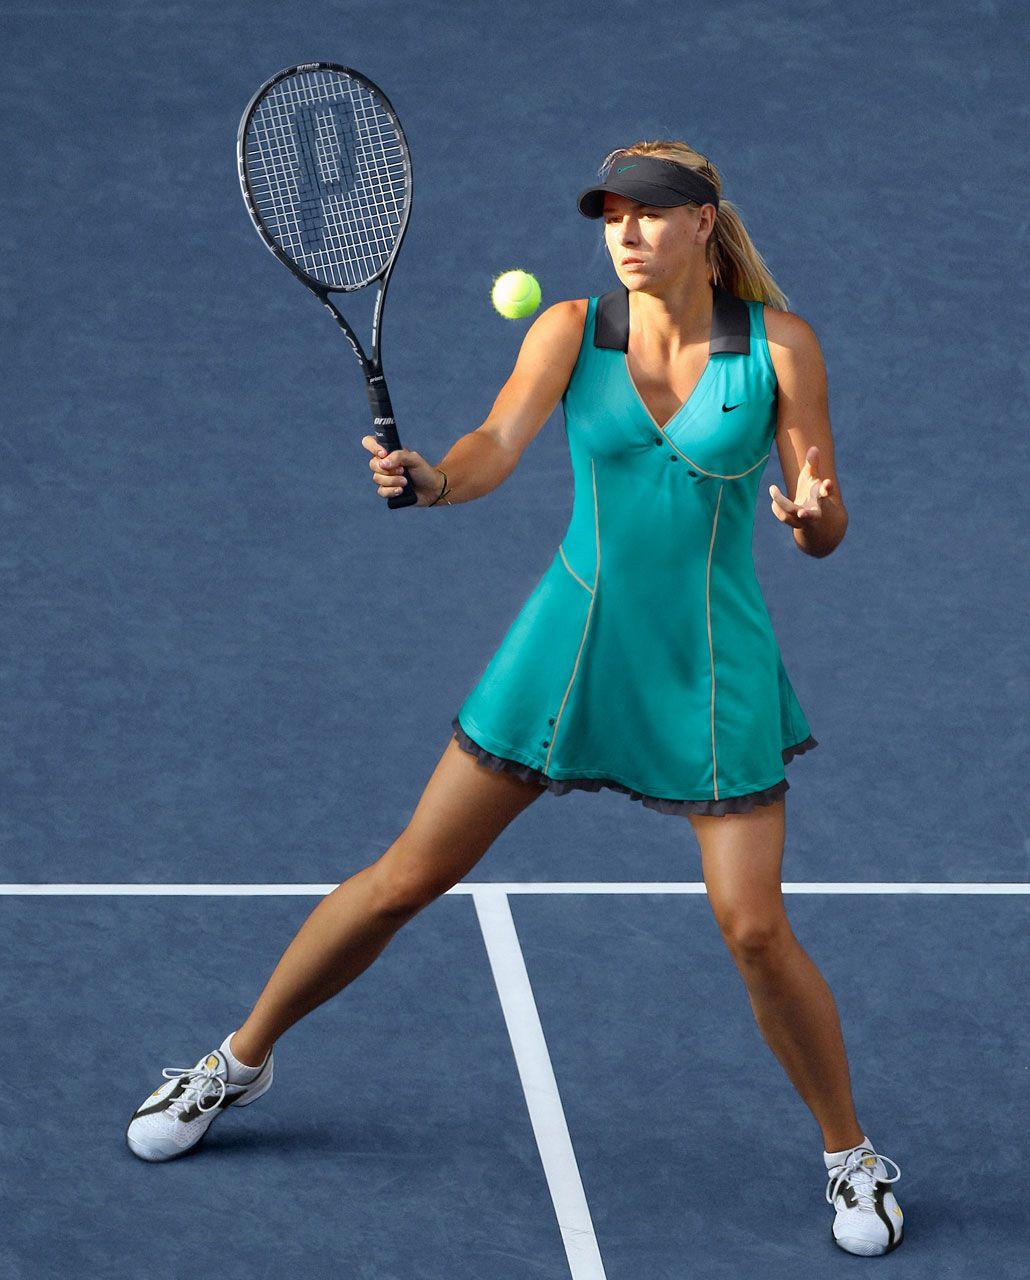 Maria Sharapova | Maria sharapova, Tennis and Tennis players